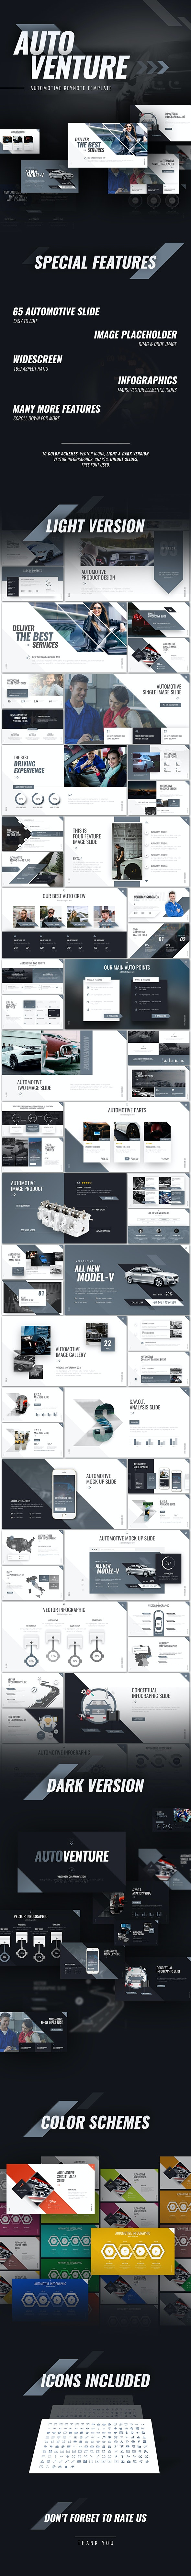 Autoventure Automotive Keynote Presentation Template - Keynote Templates Presentation Templates